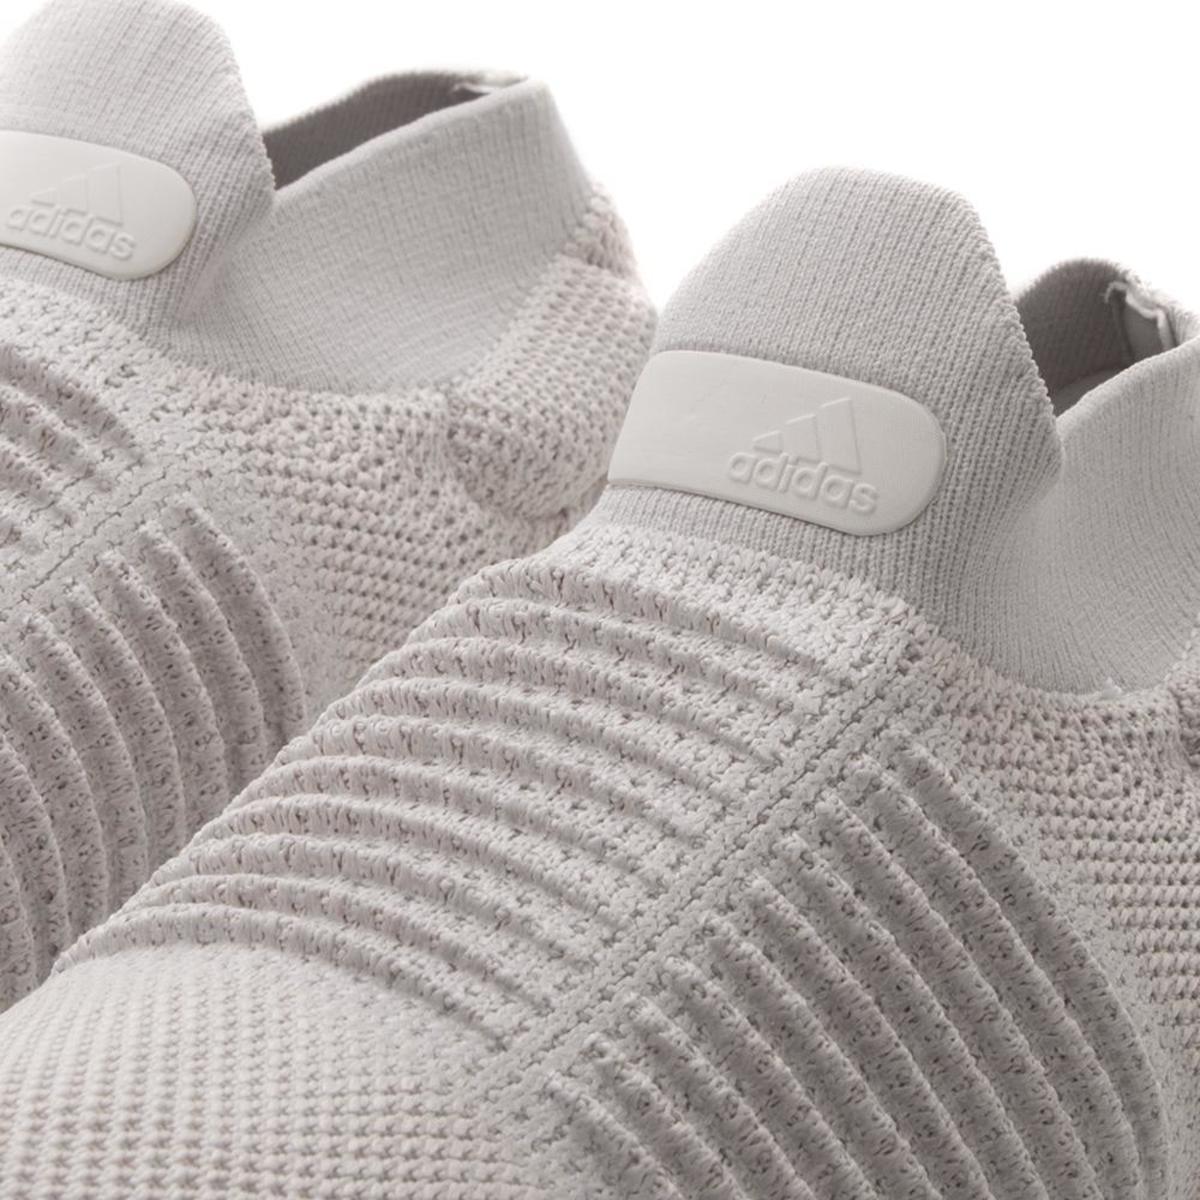 83872c2fec56 Adidas Ultraboost Laceless Sneakers - Chalk Pearl